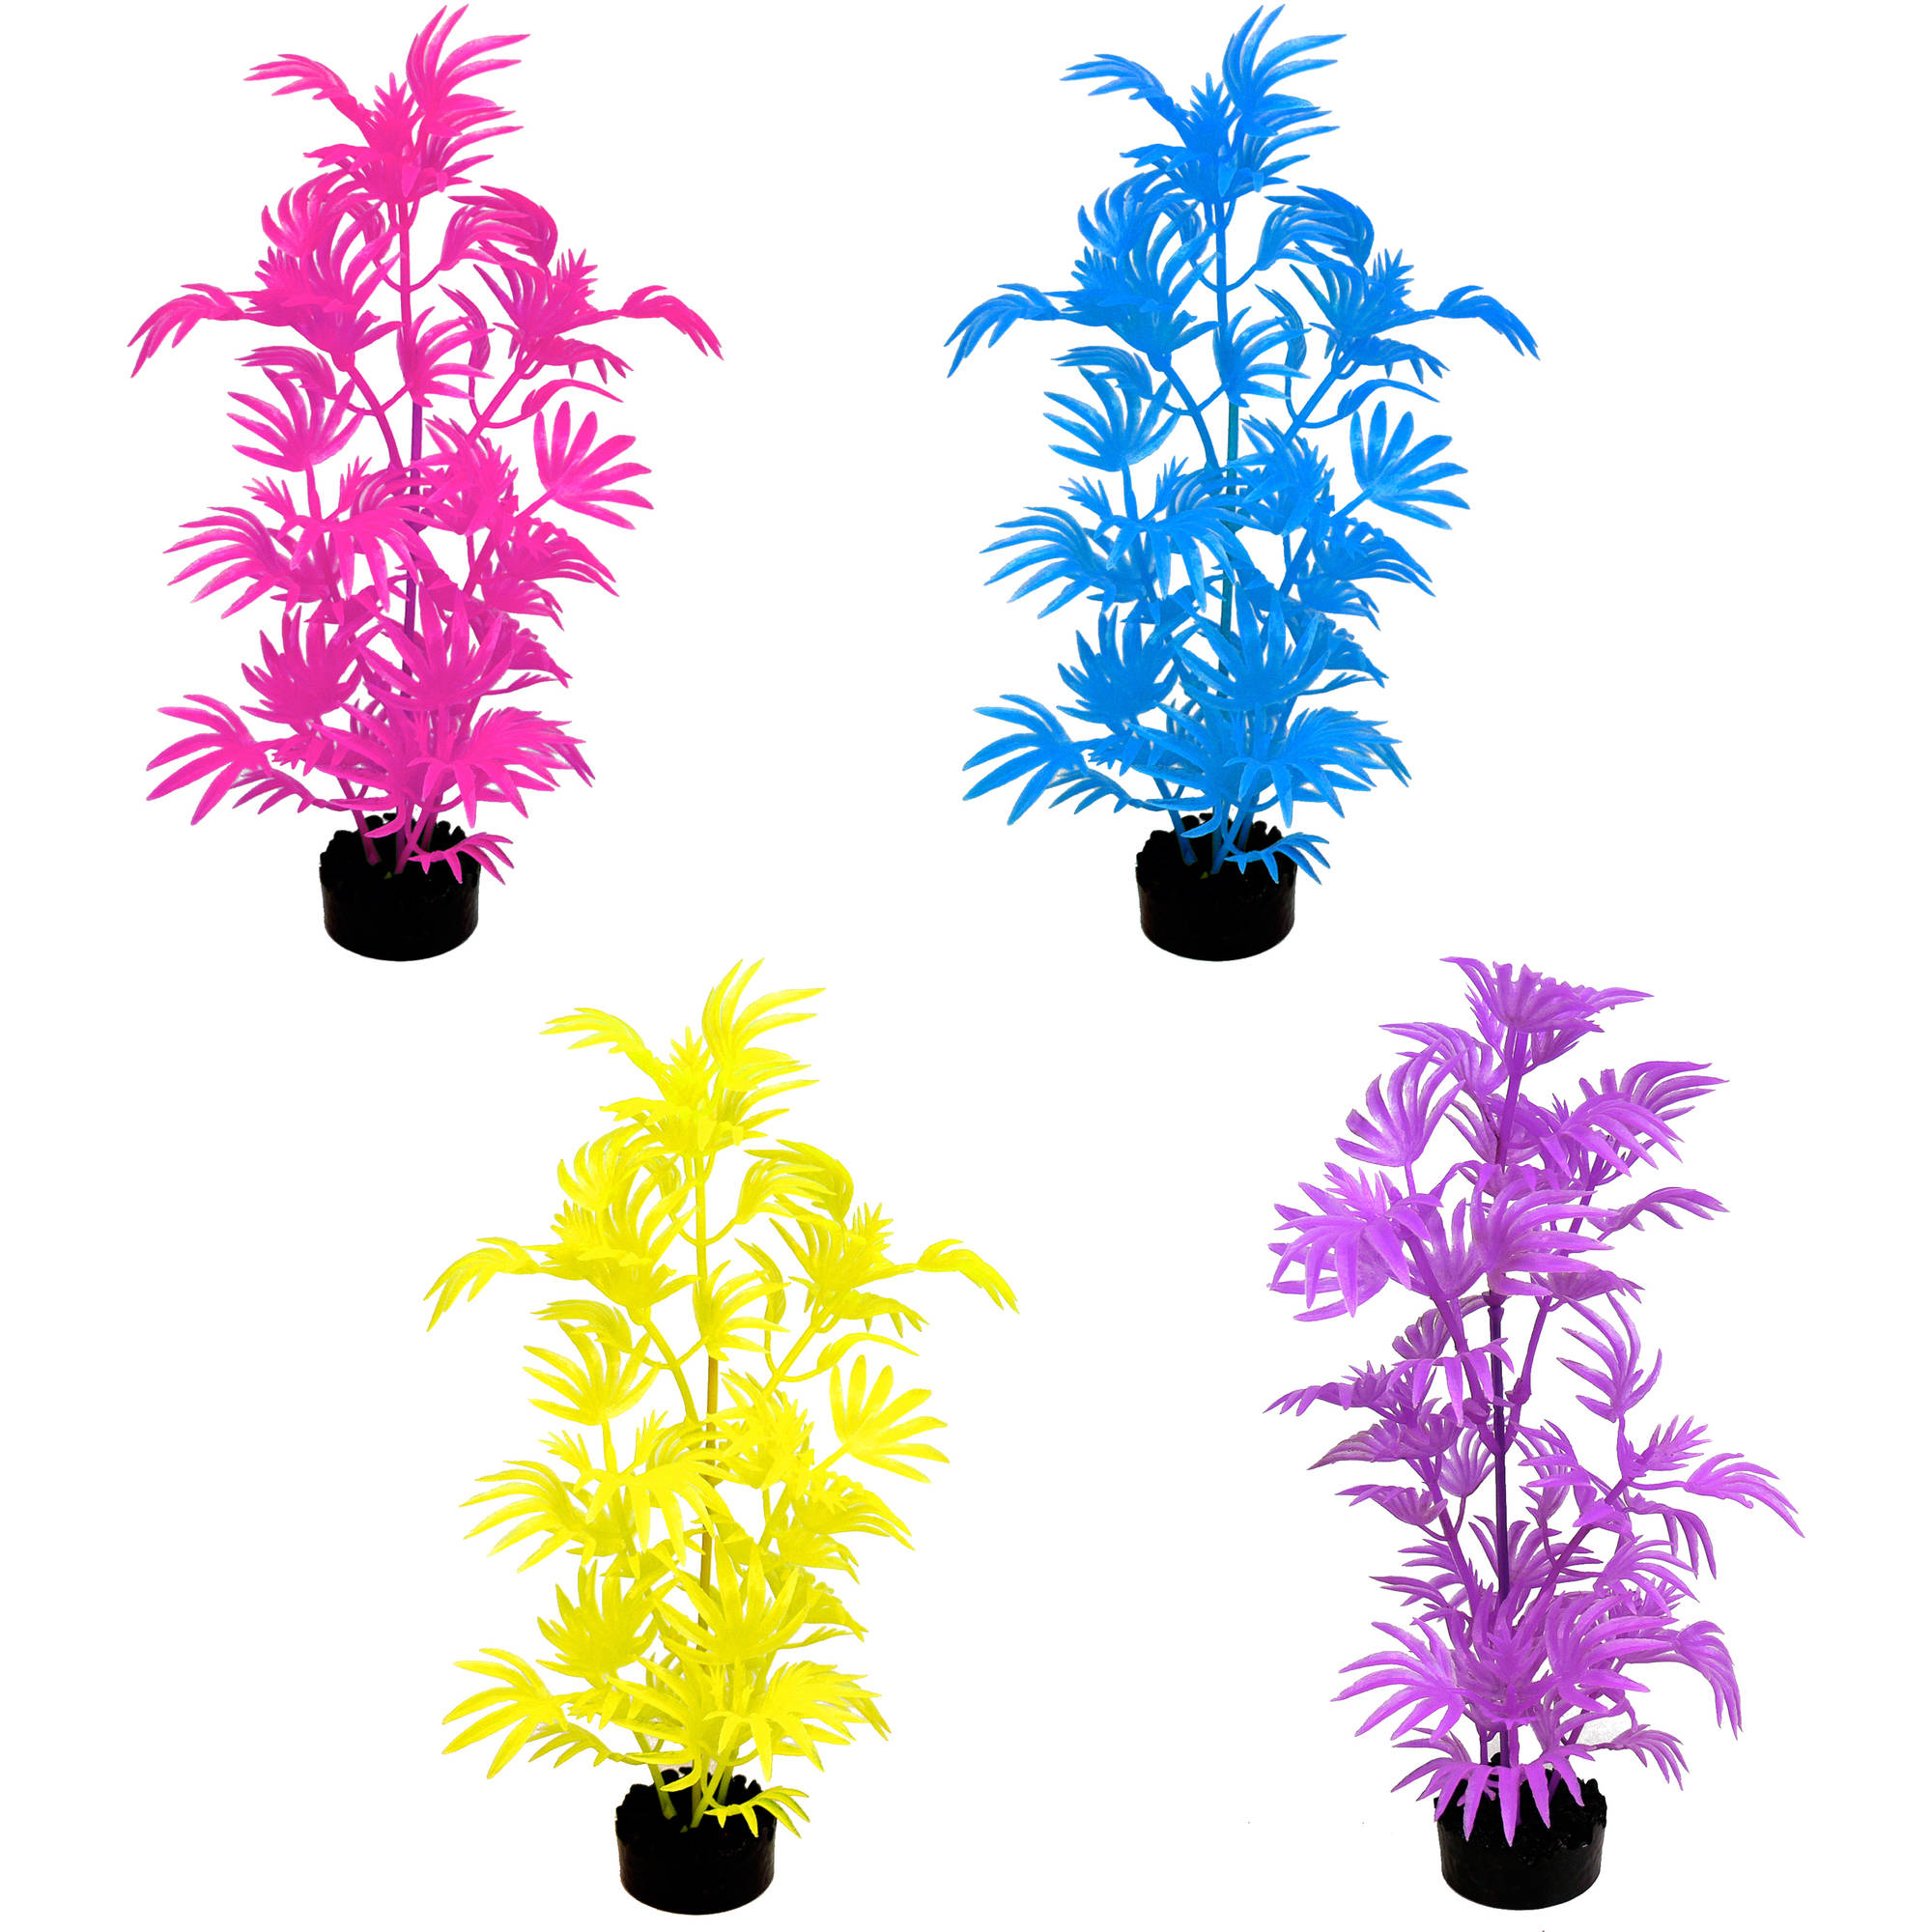 Aqua Culture Wild Flower Aquarium Plant by blue ribbon pet products inc